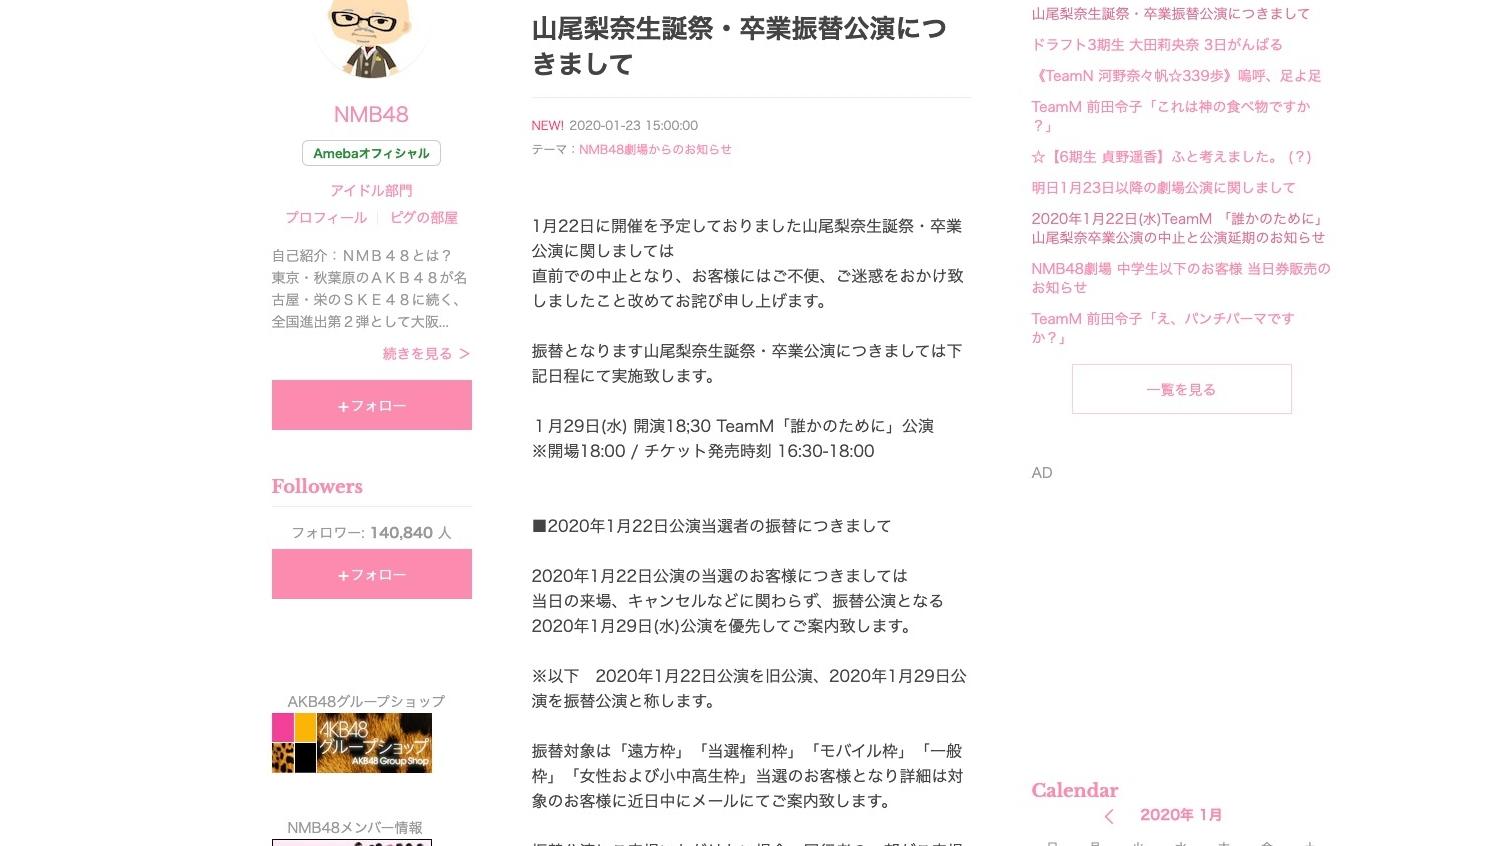 【NMB48】山尾梨奈生誕祭・卒業振替公演が1月29日TeamM「誰かのために」公演で開催